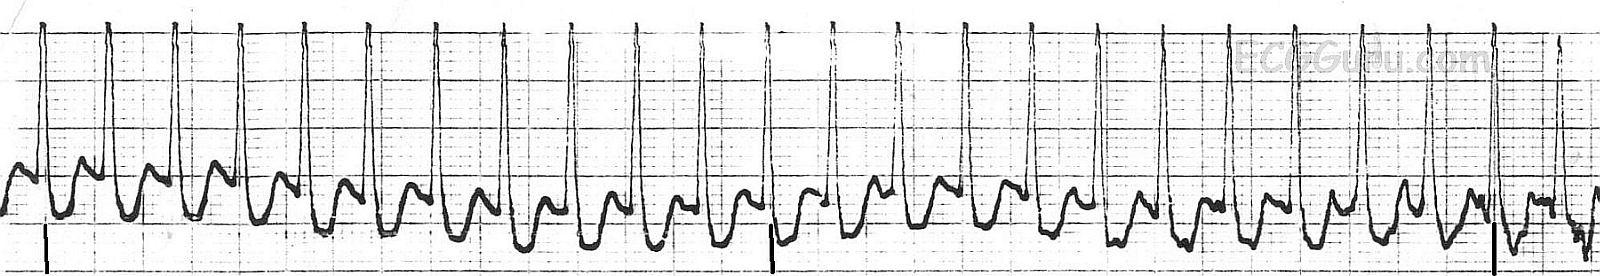 ECG Basics: Paroxysmal Supraventricular Tachycardia ...